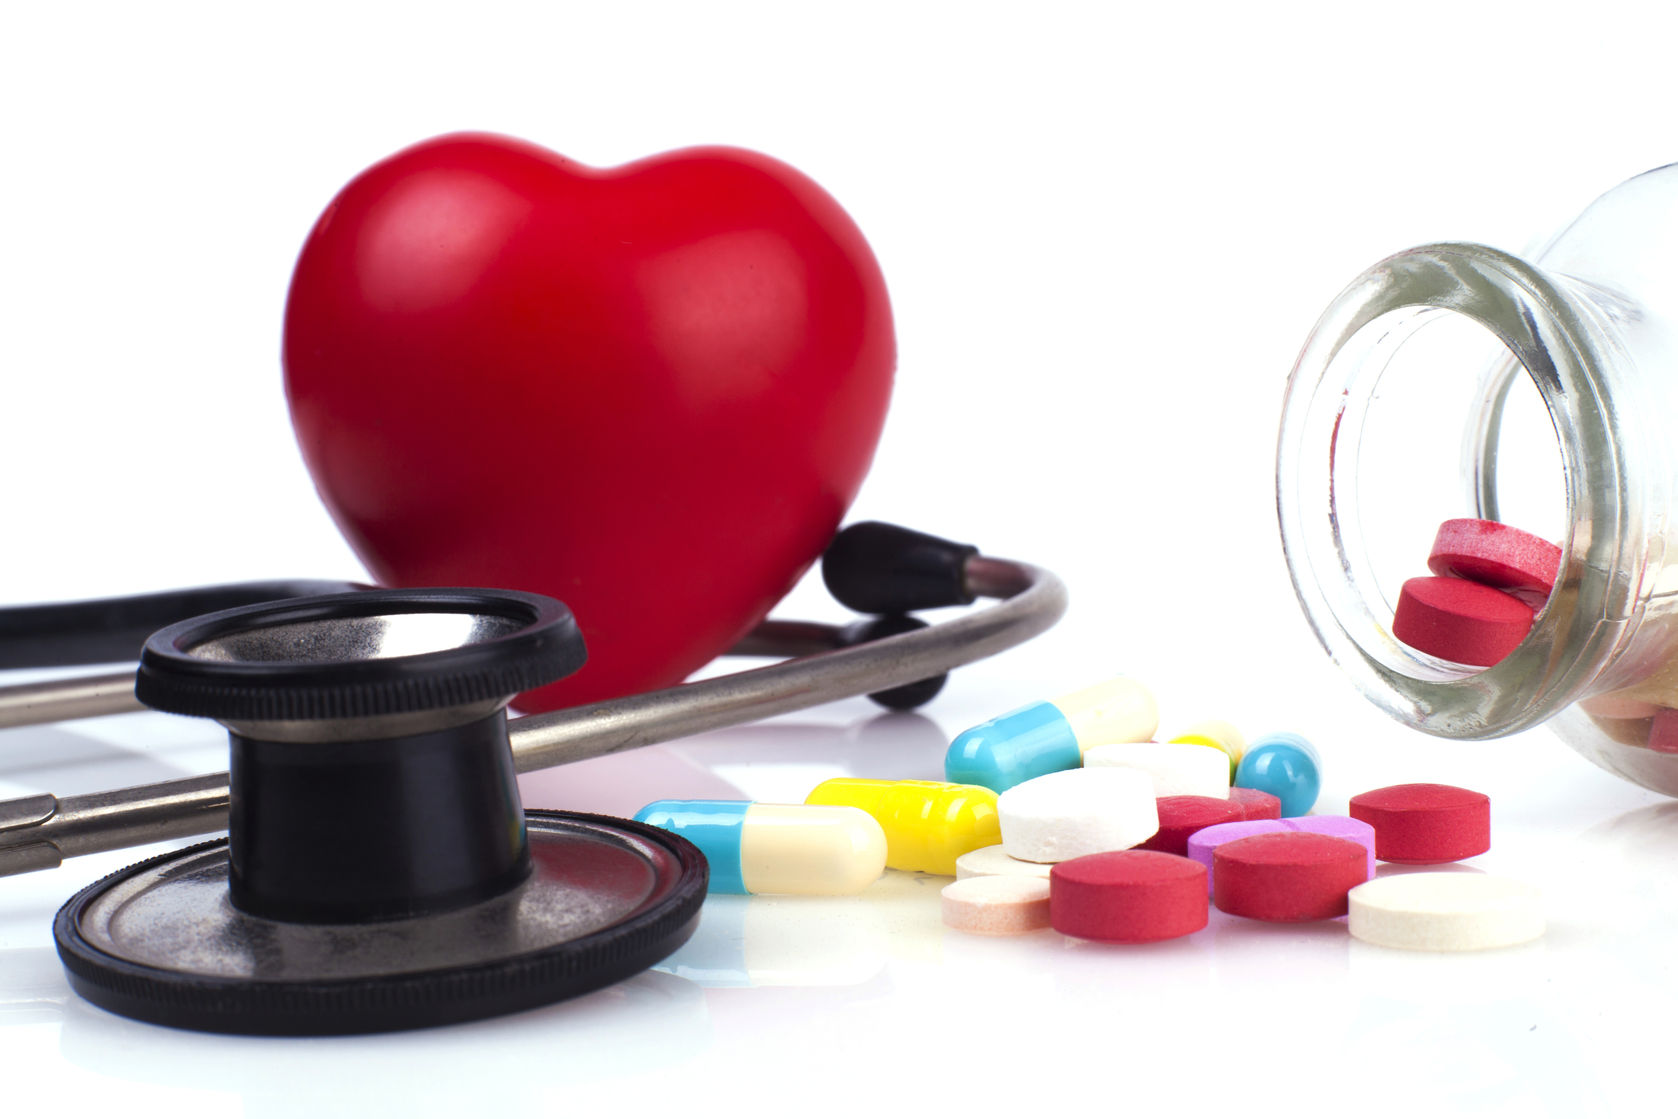 http://www.info-on-high-blood-pressure.com/listhighbloodpressuremedications.html